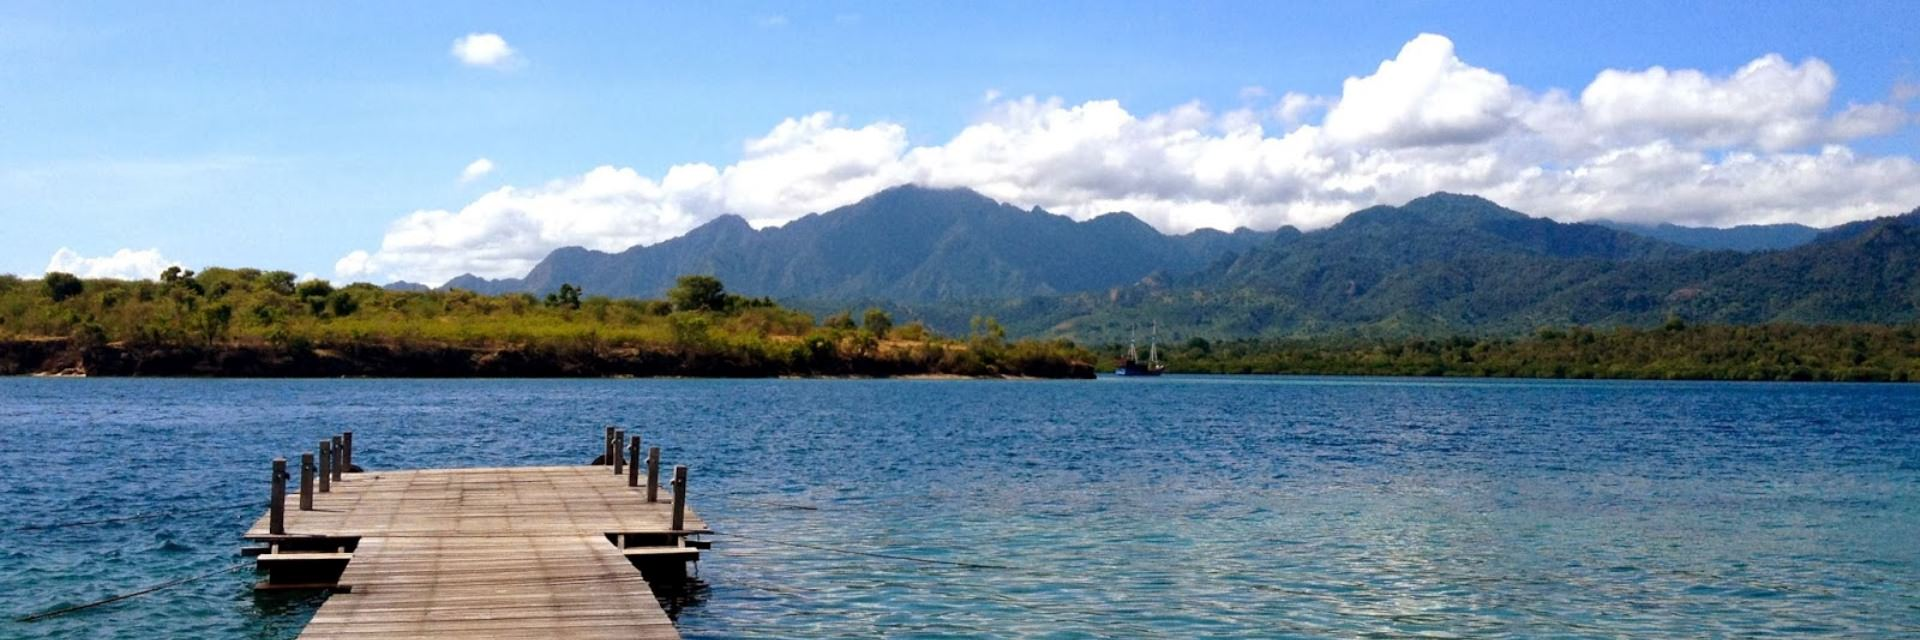 Pulau Menjangan, Surga Sempurna di Bali Barat Pulau Menjangan Surga Sempurna di Bali Barat - Dolan Dolen